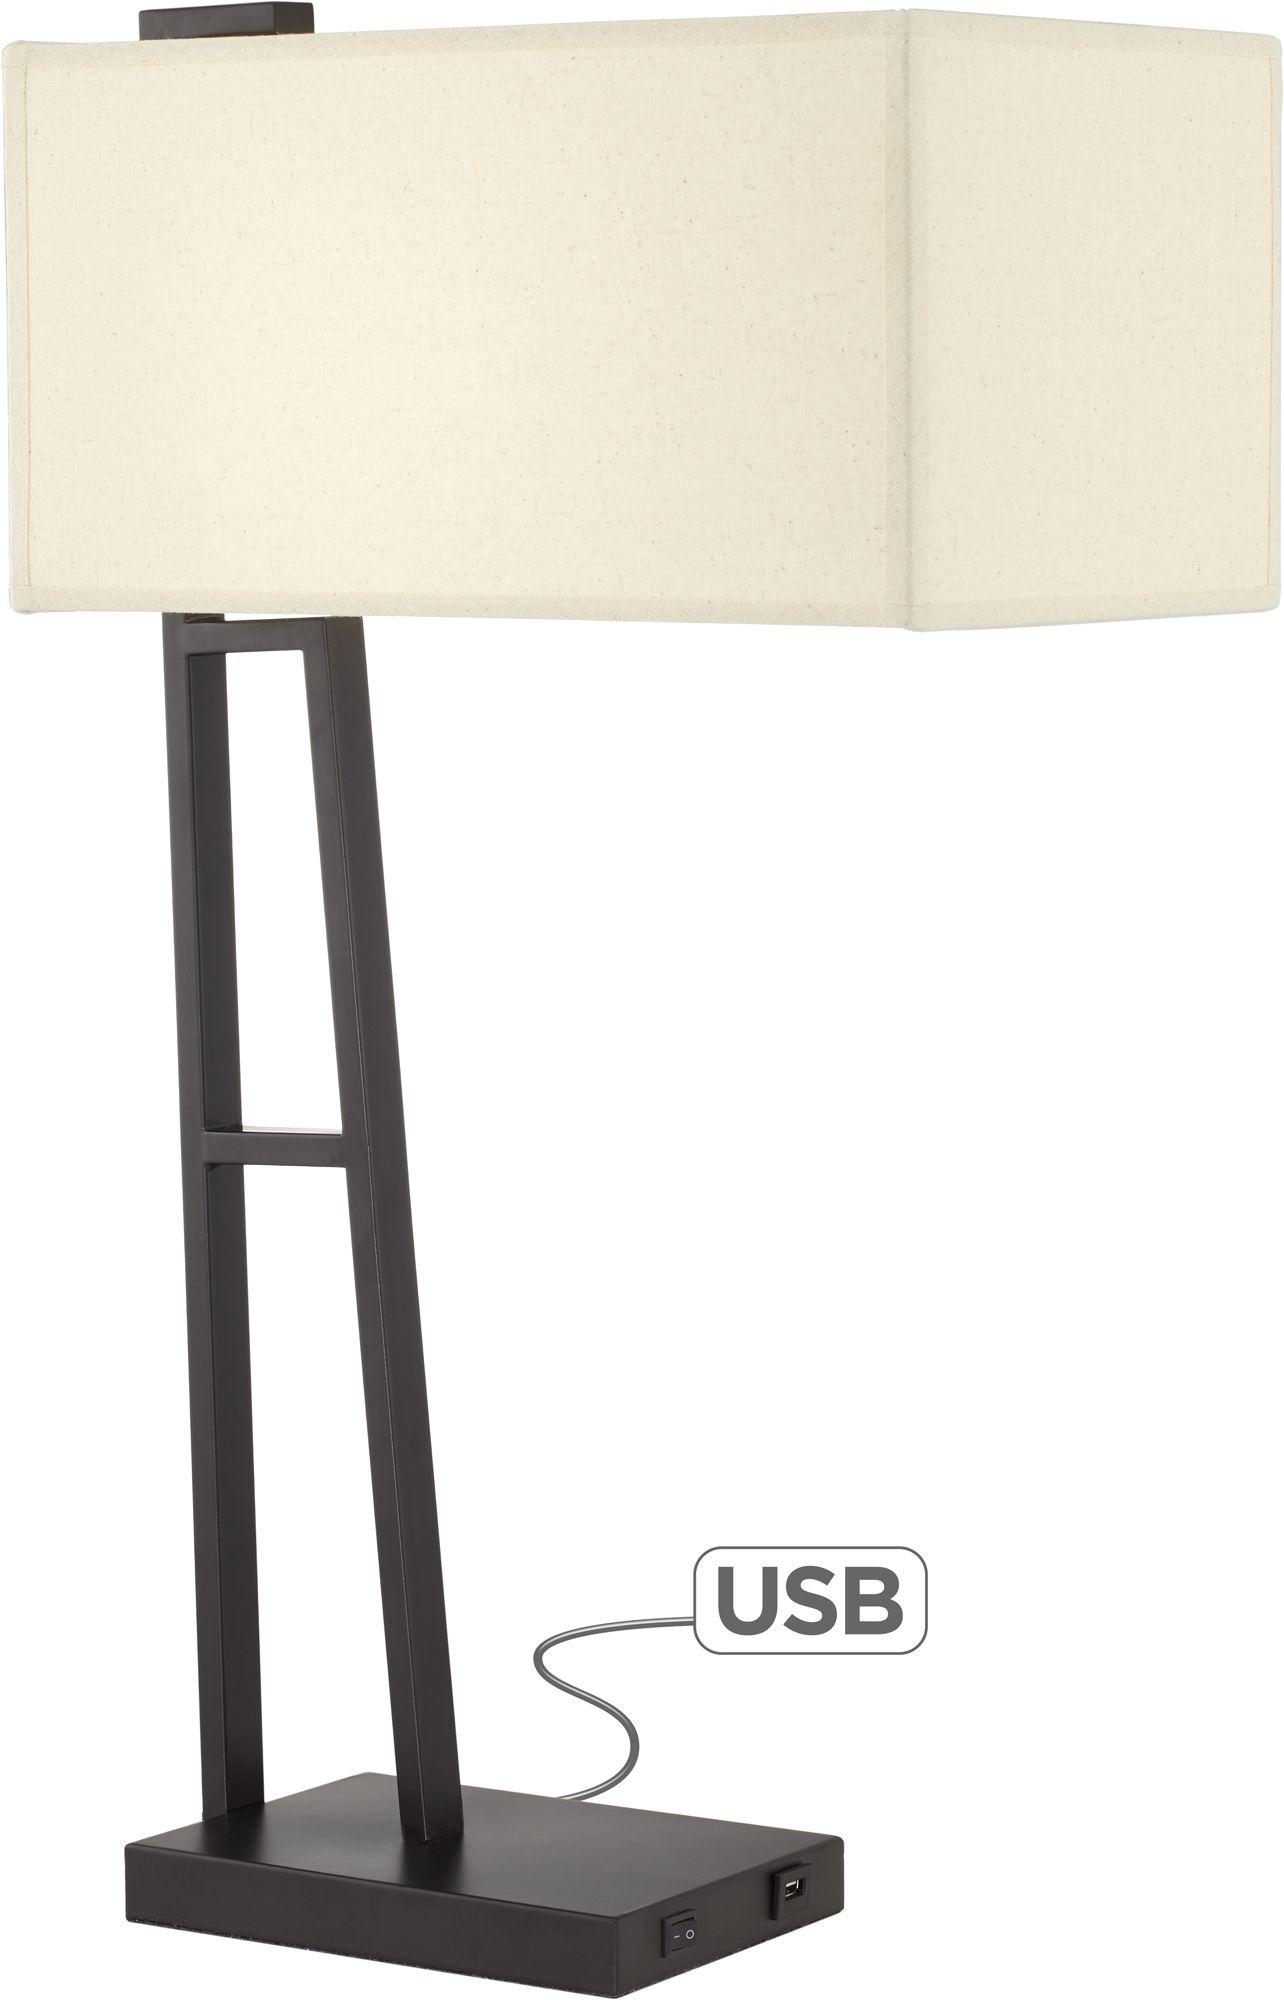 castor matte black linear modern table lamp with usb port